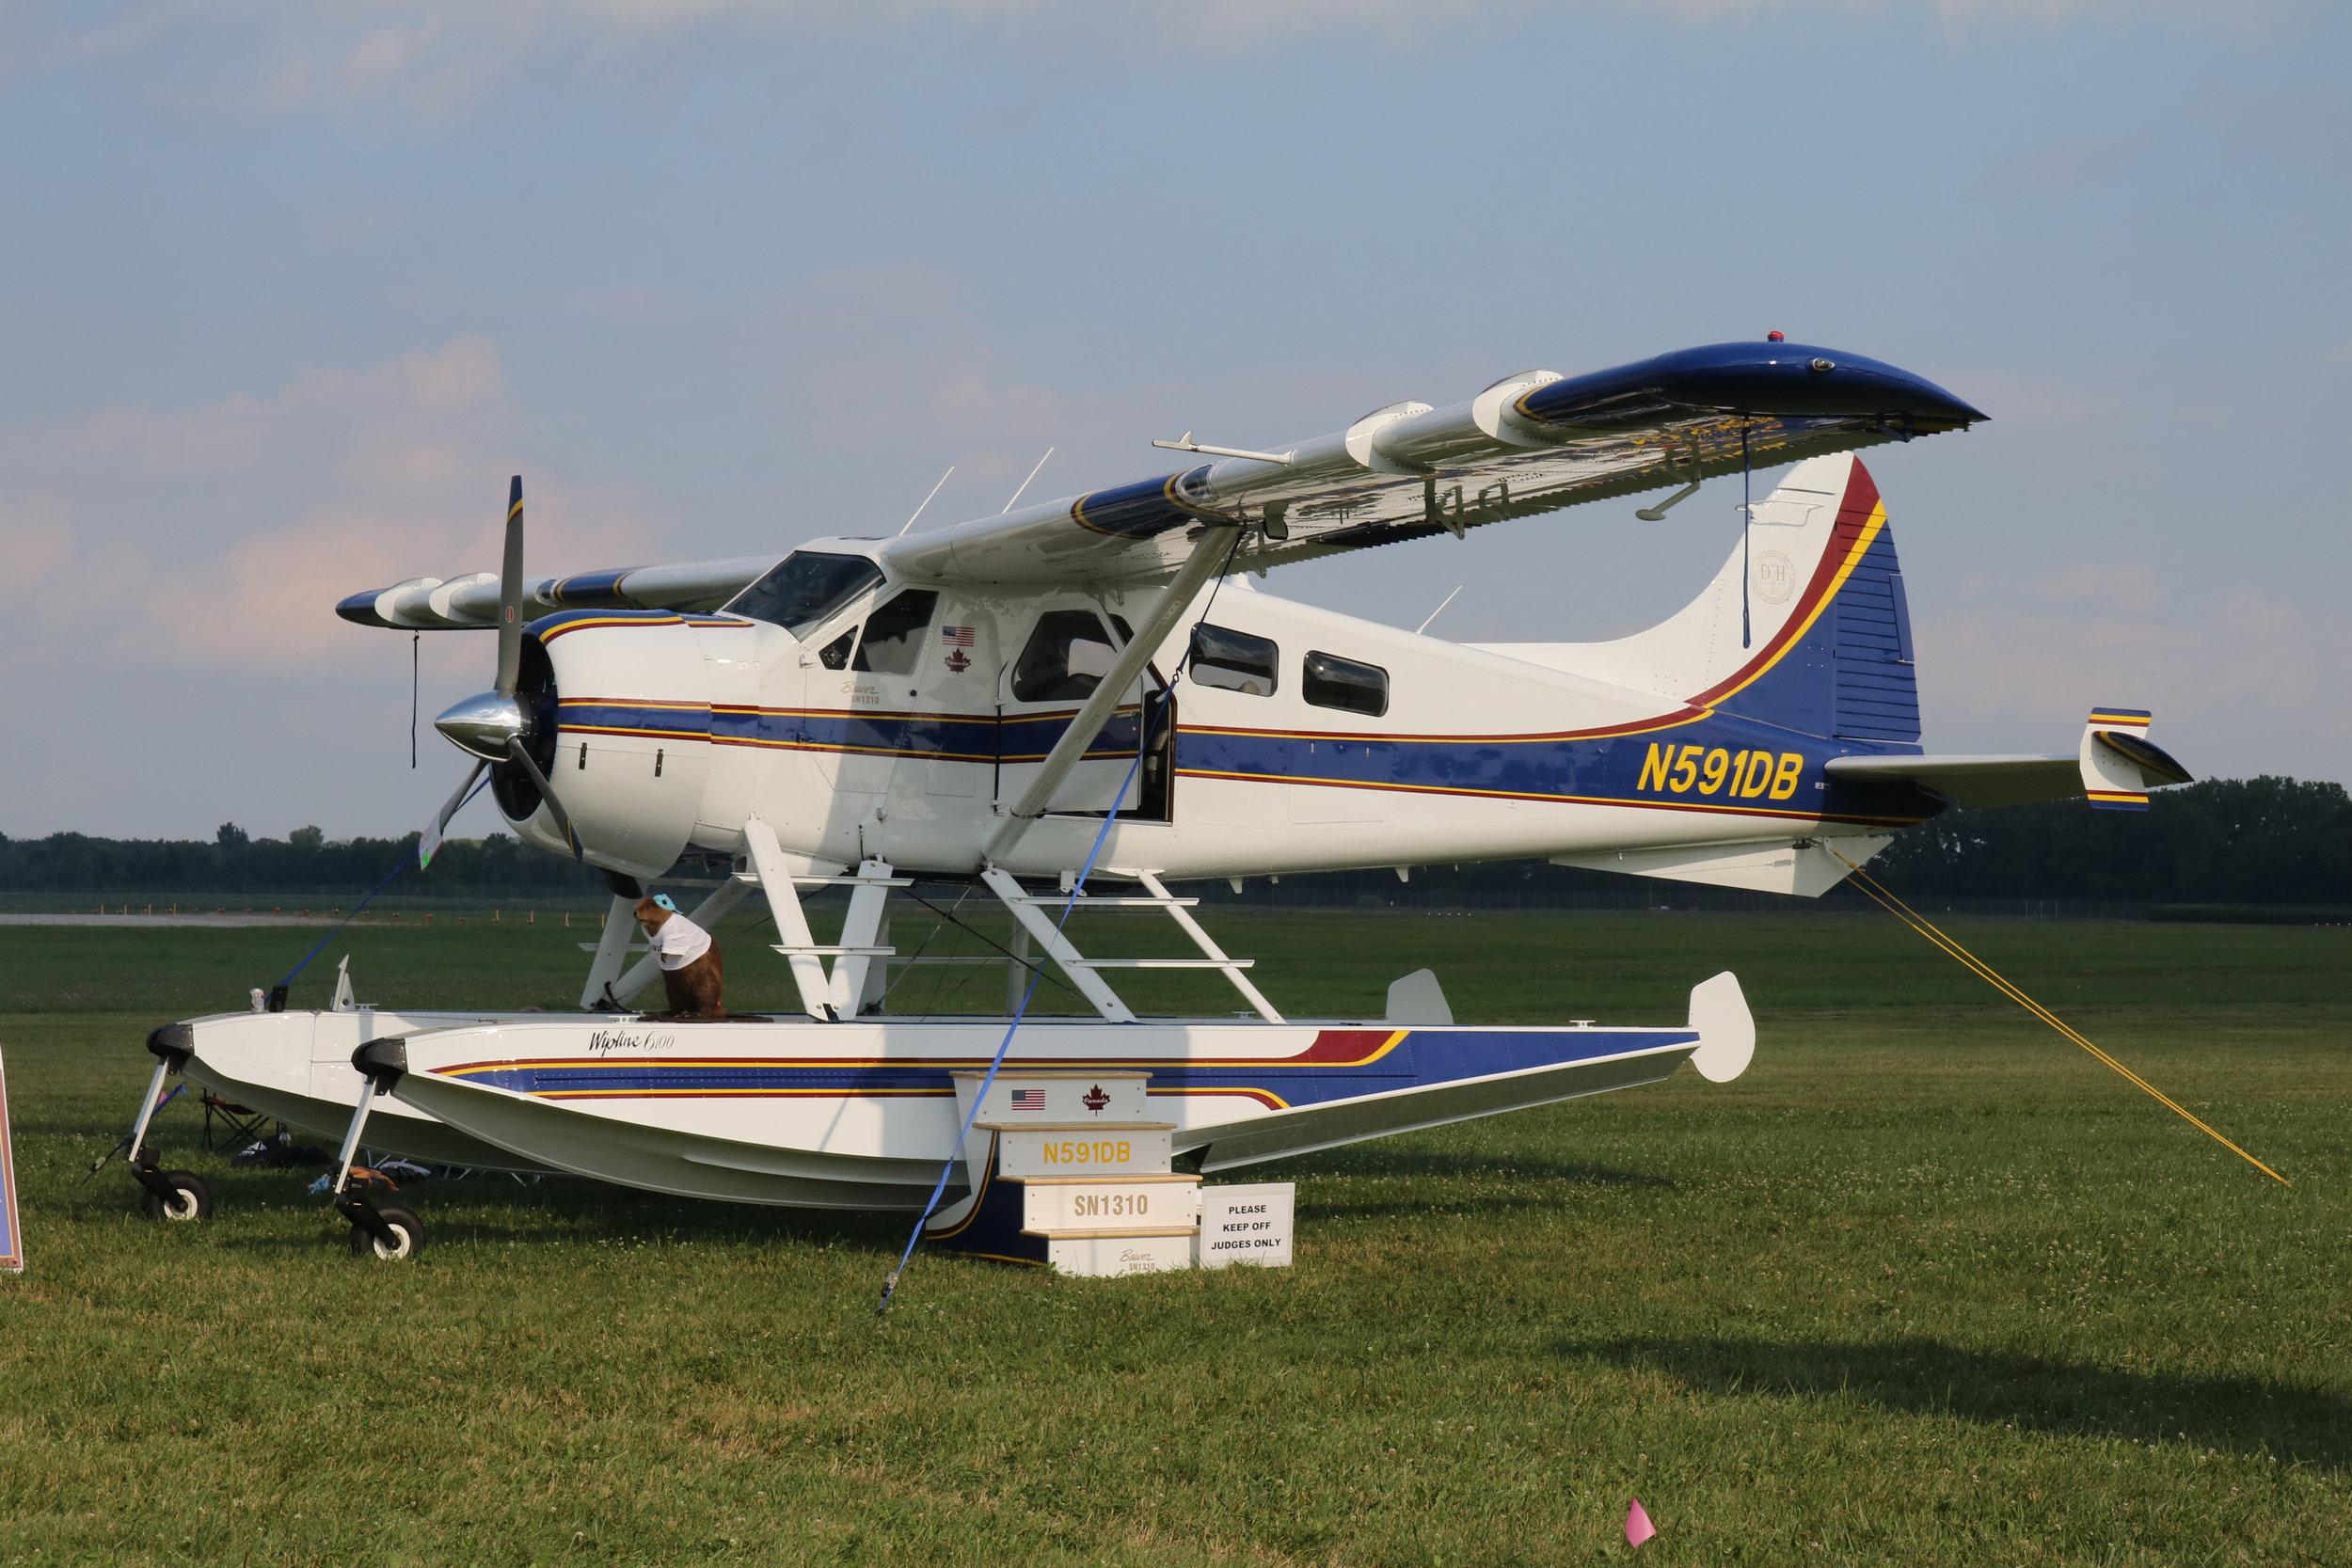 N591DB Wet Dreams DHC-2 Beaver taken at Oshkosh 25th July 2018 by Andrew Tenny